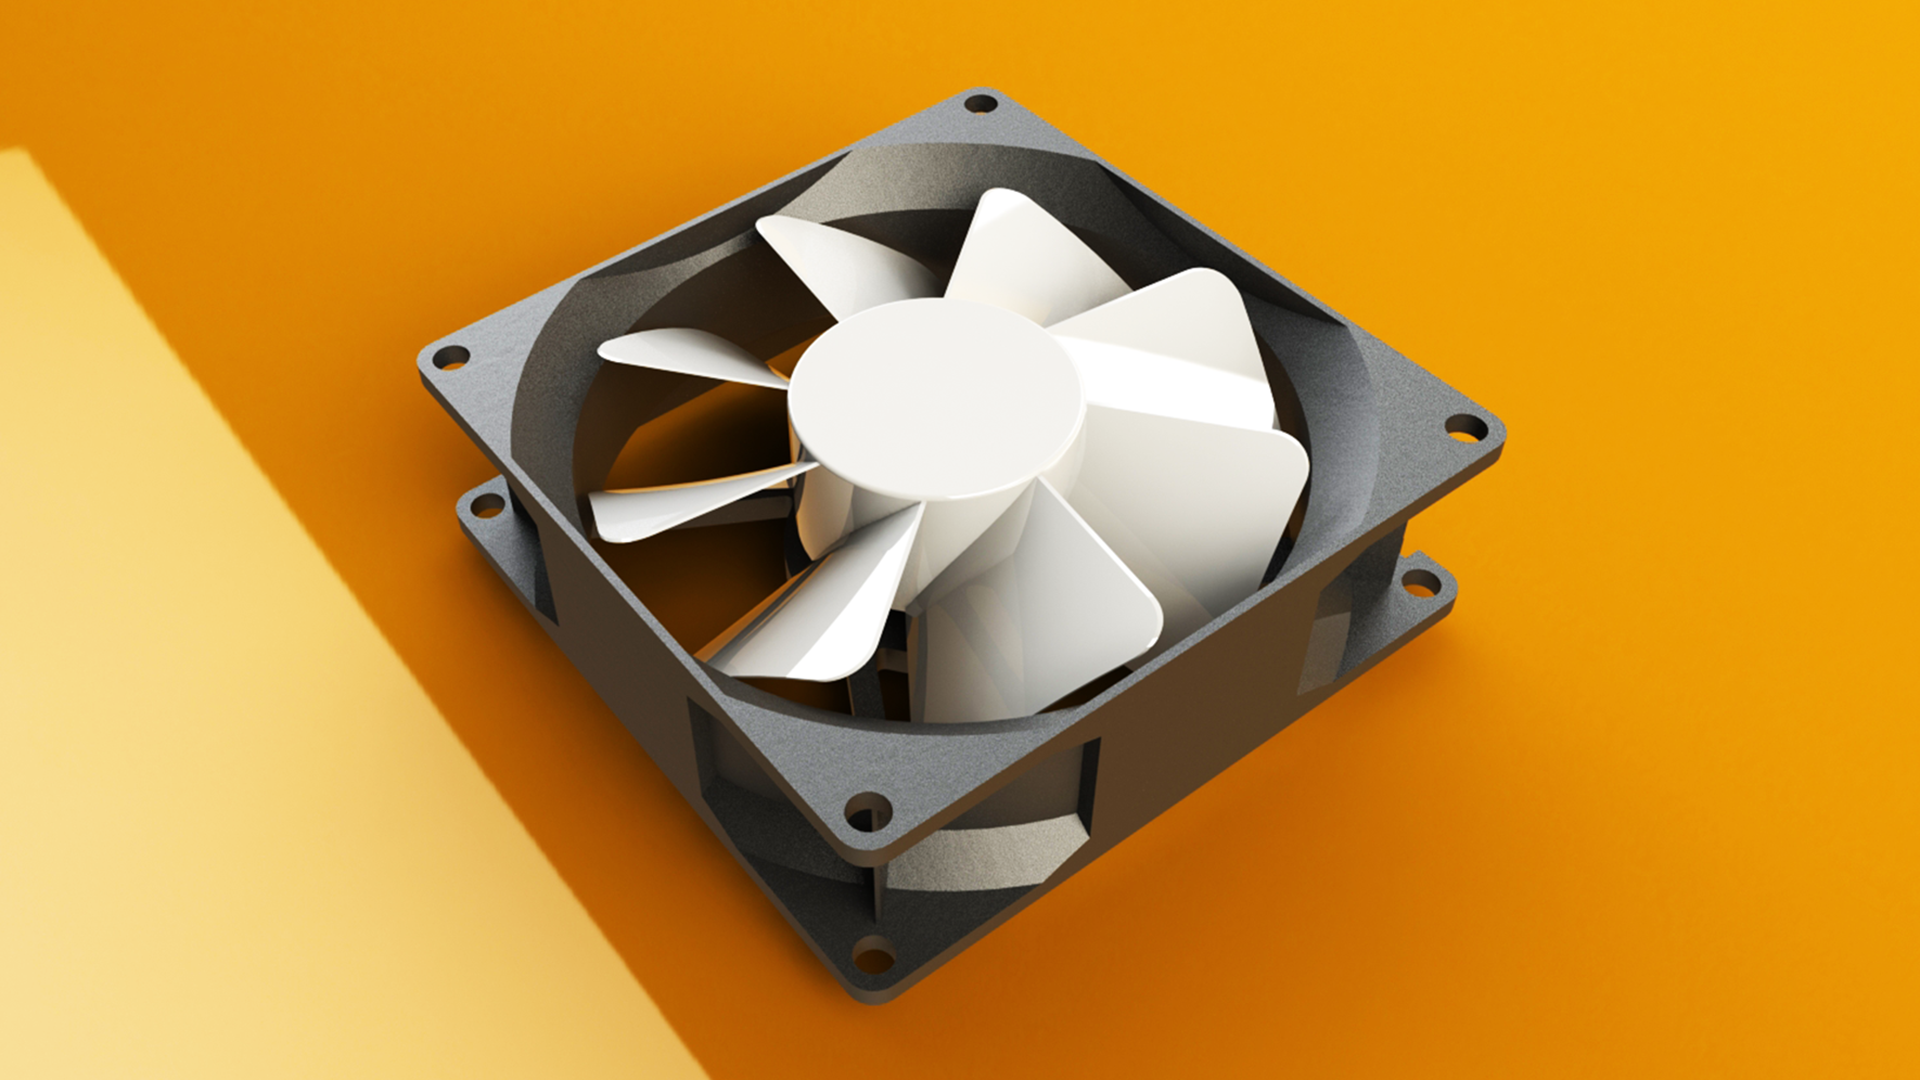 SolidWorks模型免费下载:电脑风扇